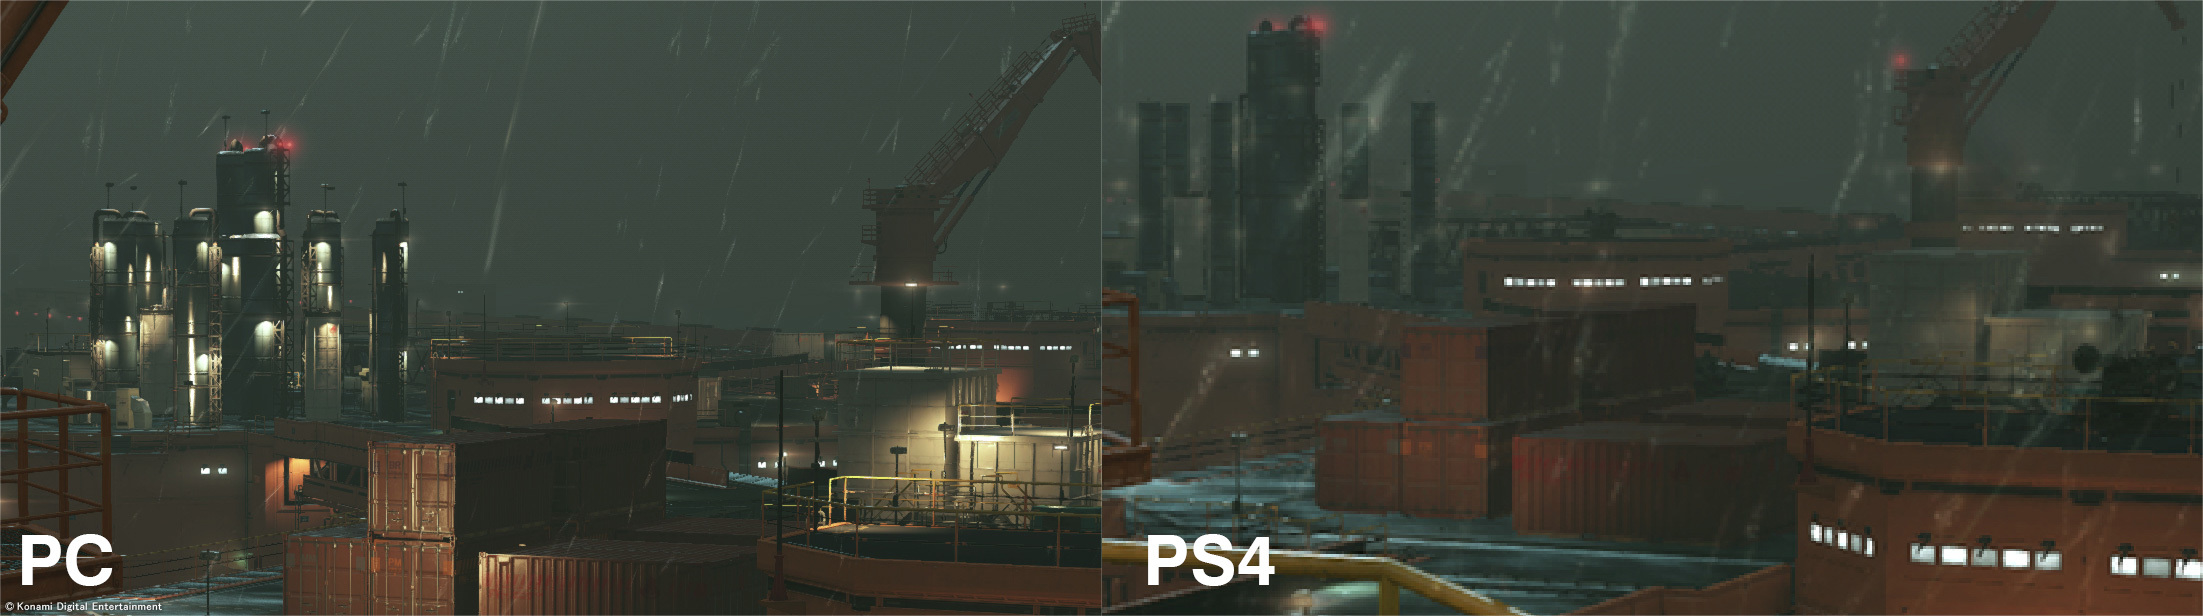 Foto de Metal Gear Solid V: The Phantom Pain (19/24)